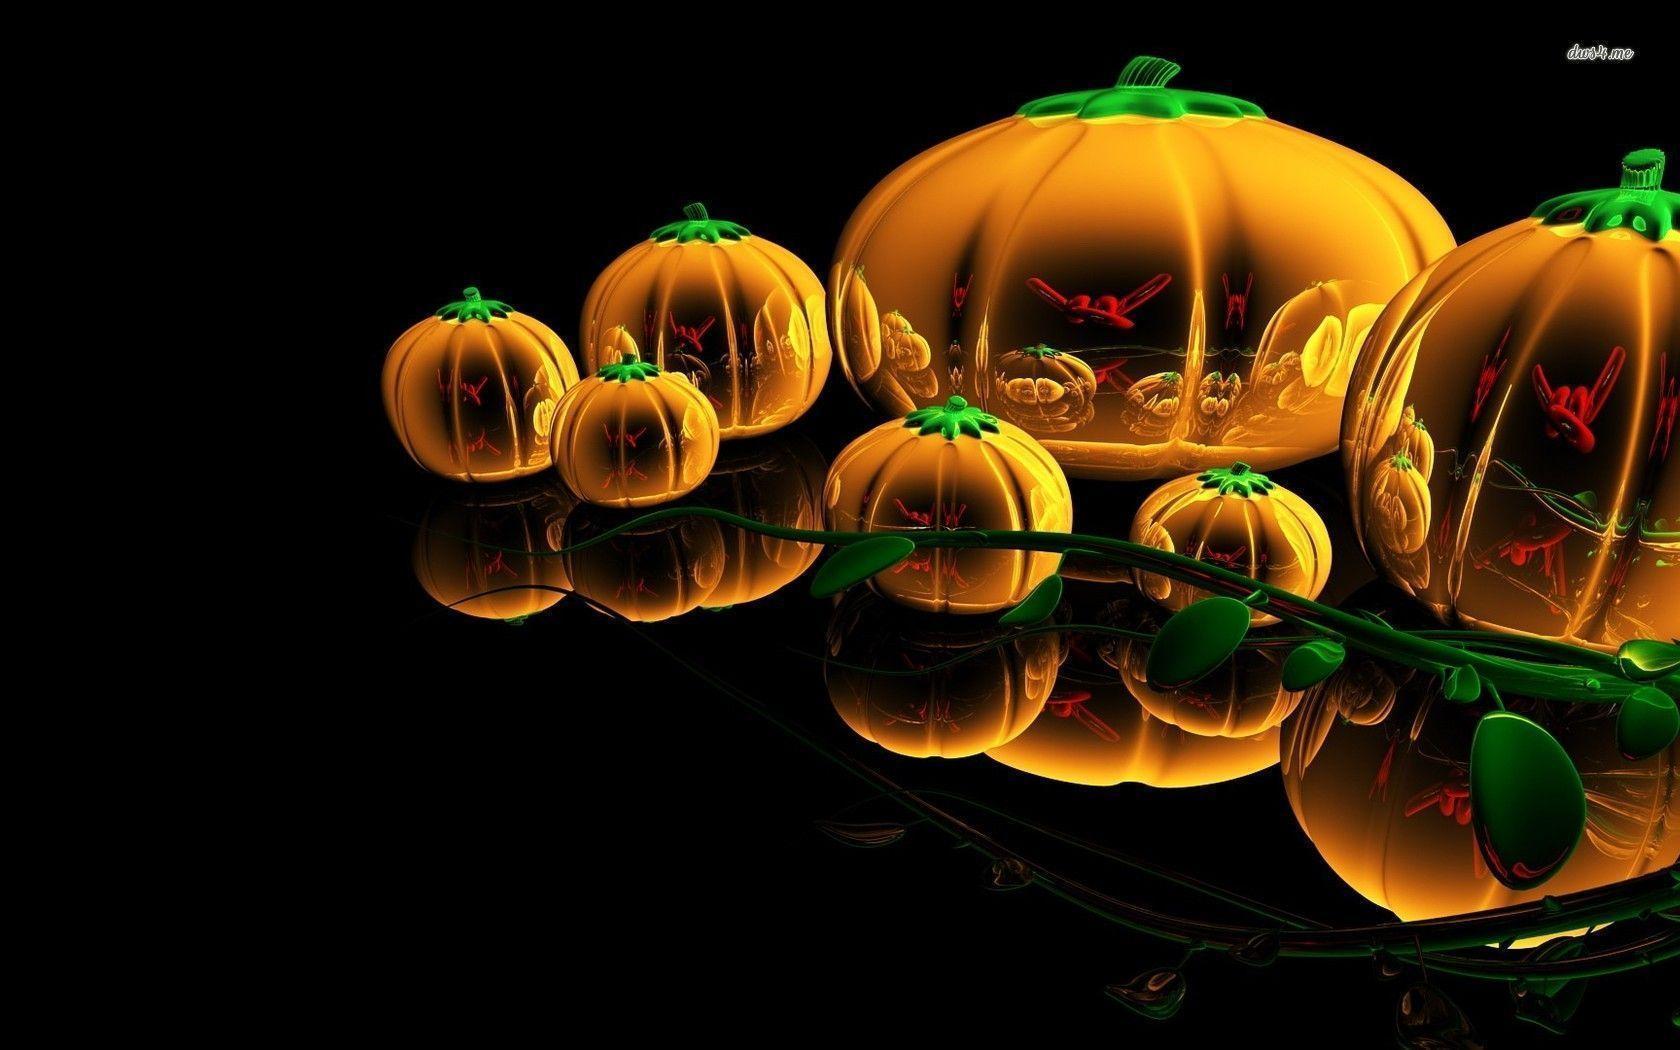 Fall Free Wallpaper Cave Pumpkin Halloween Wallpapers Wallpaper Cave